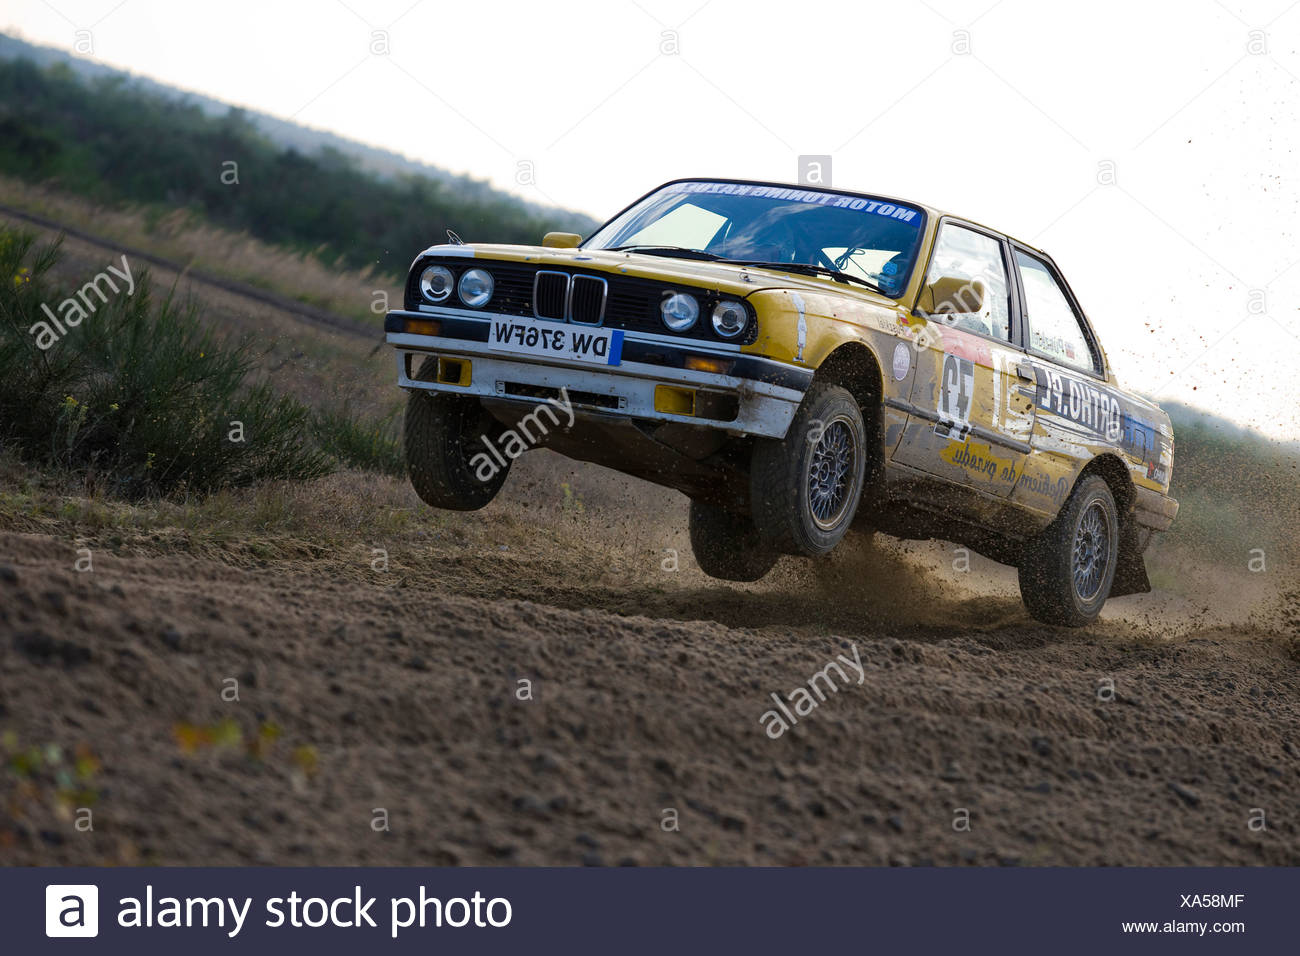 BMW 318is jumping, Lausitz Rally, motorsports, Saxony, Germany, Europe - Stock Image